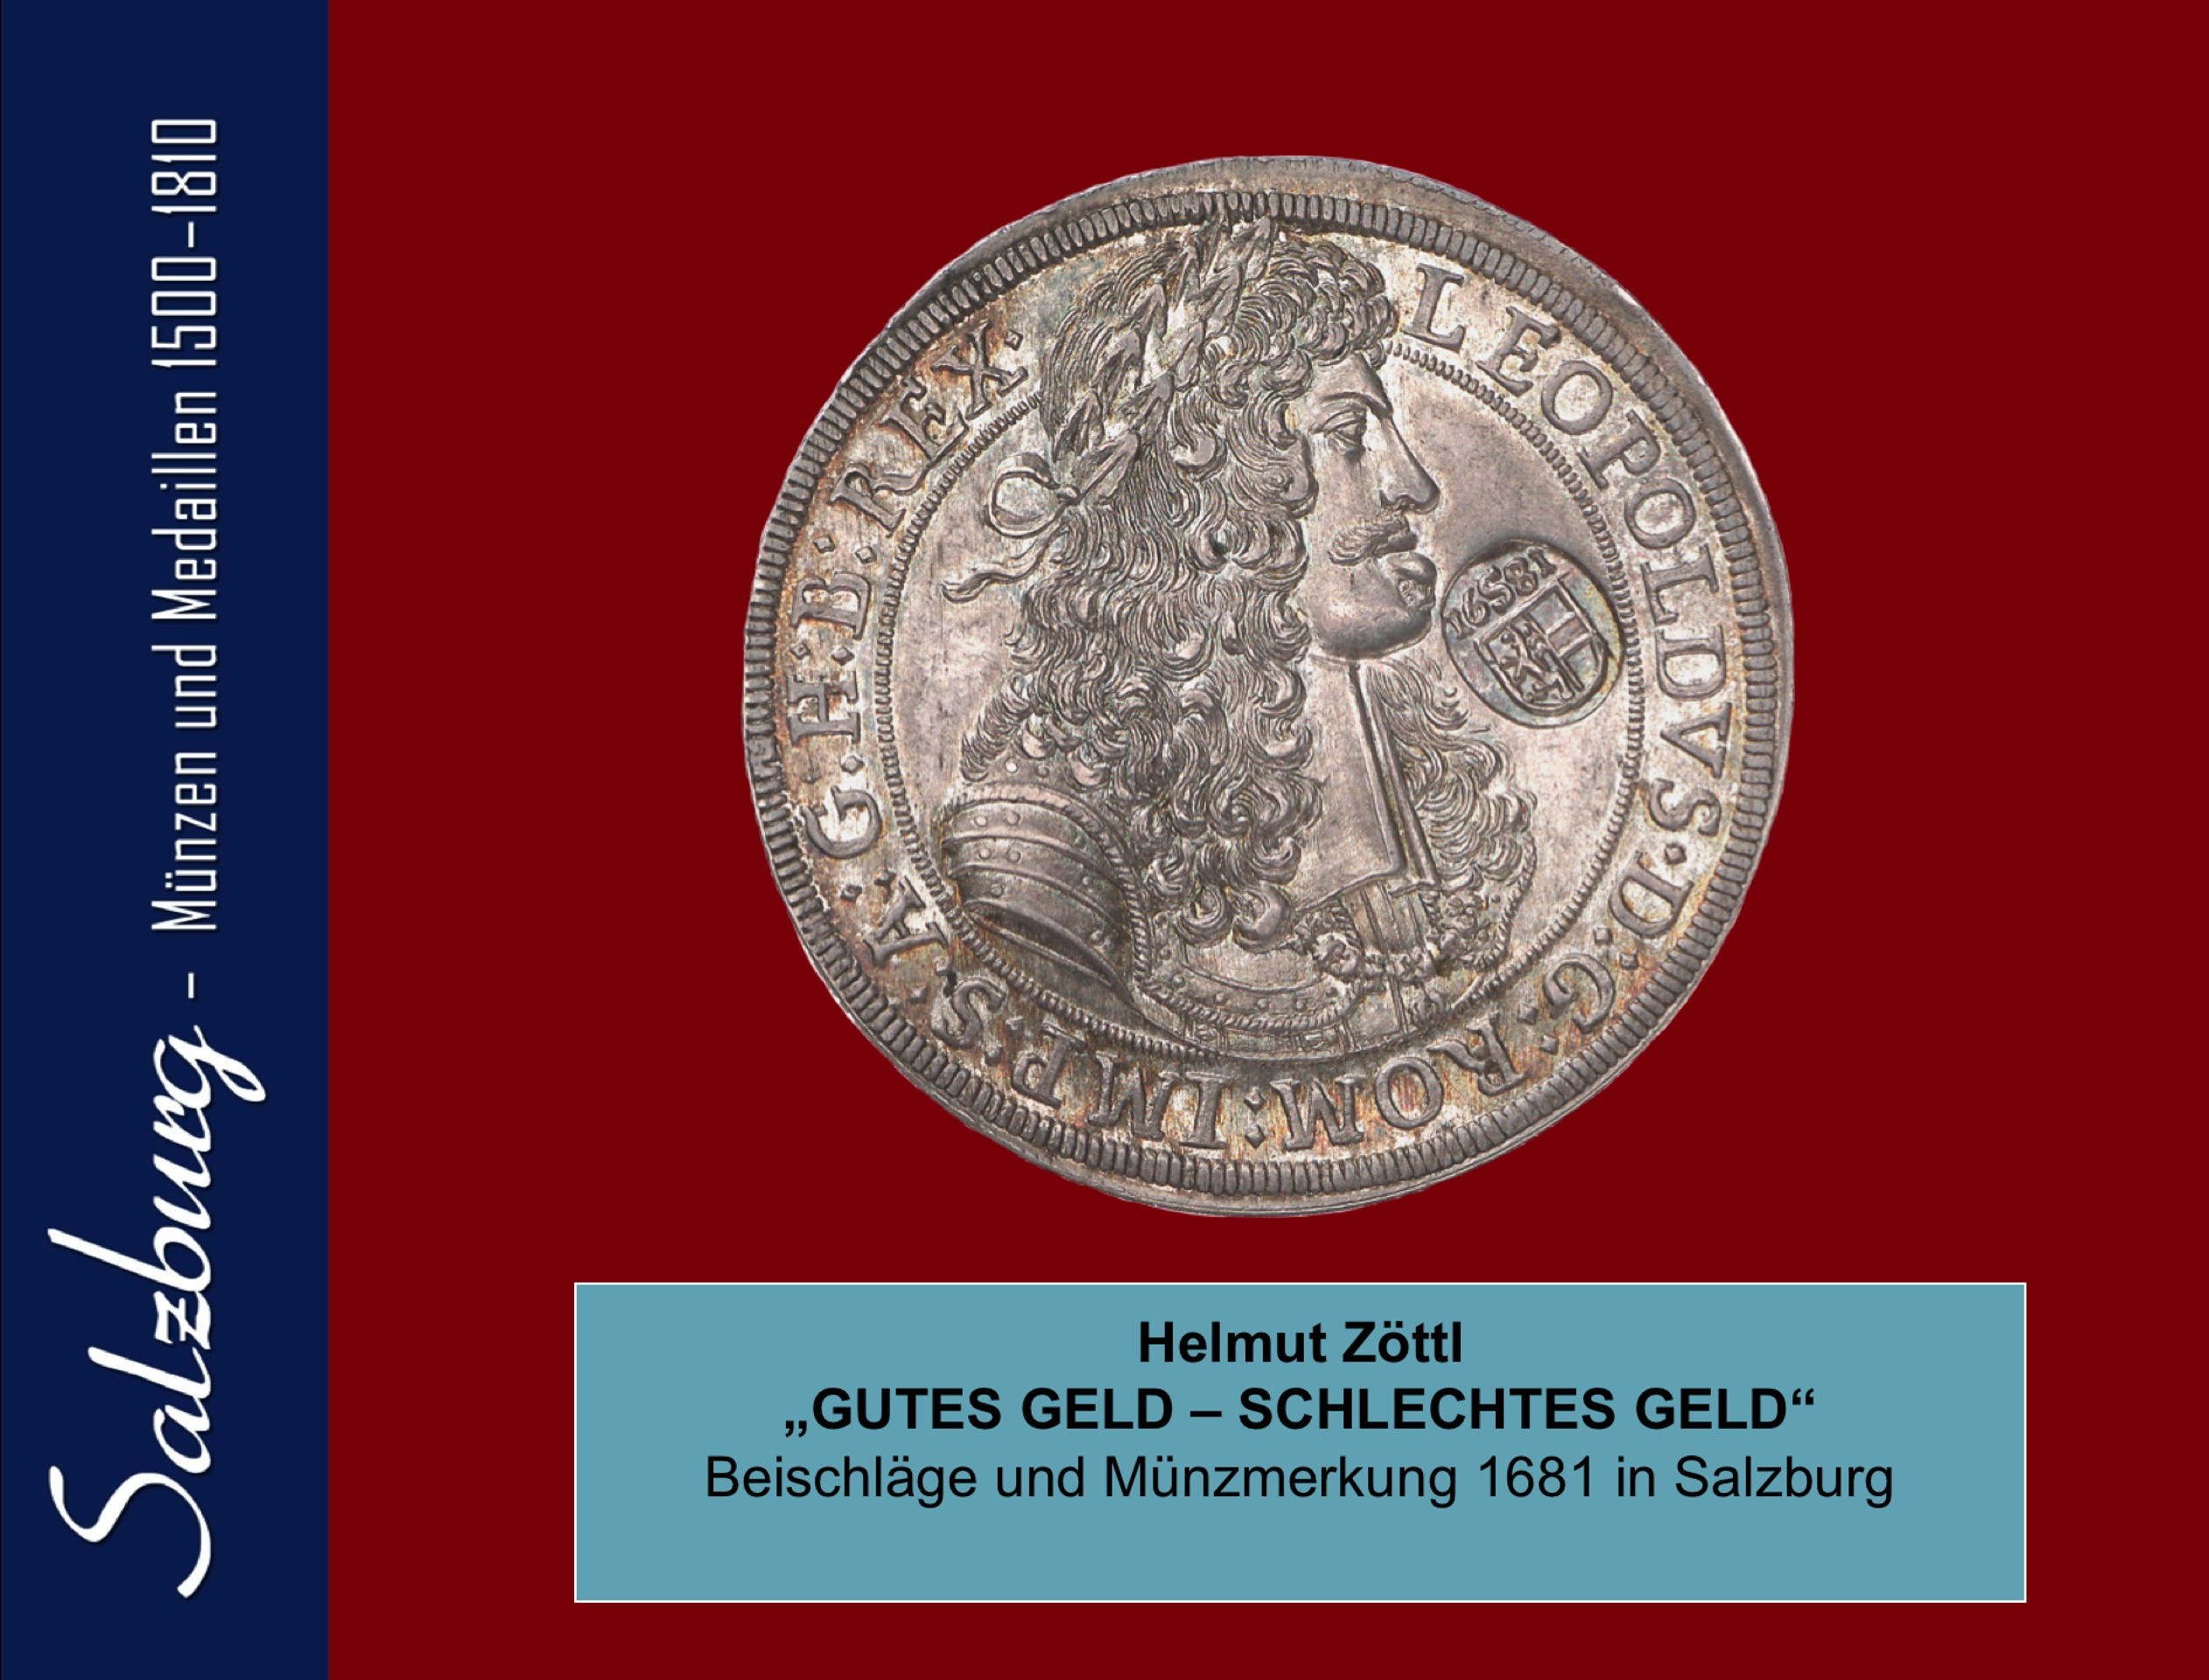 SNG Vortrag Helmut Zöttl, 16.11.2016, Salzburg